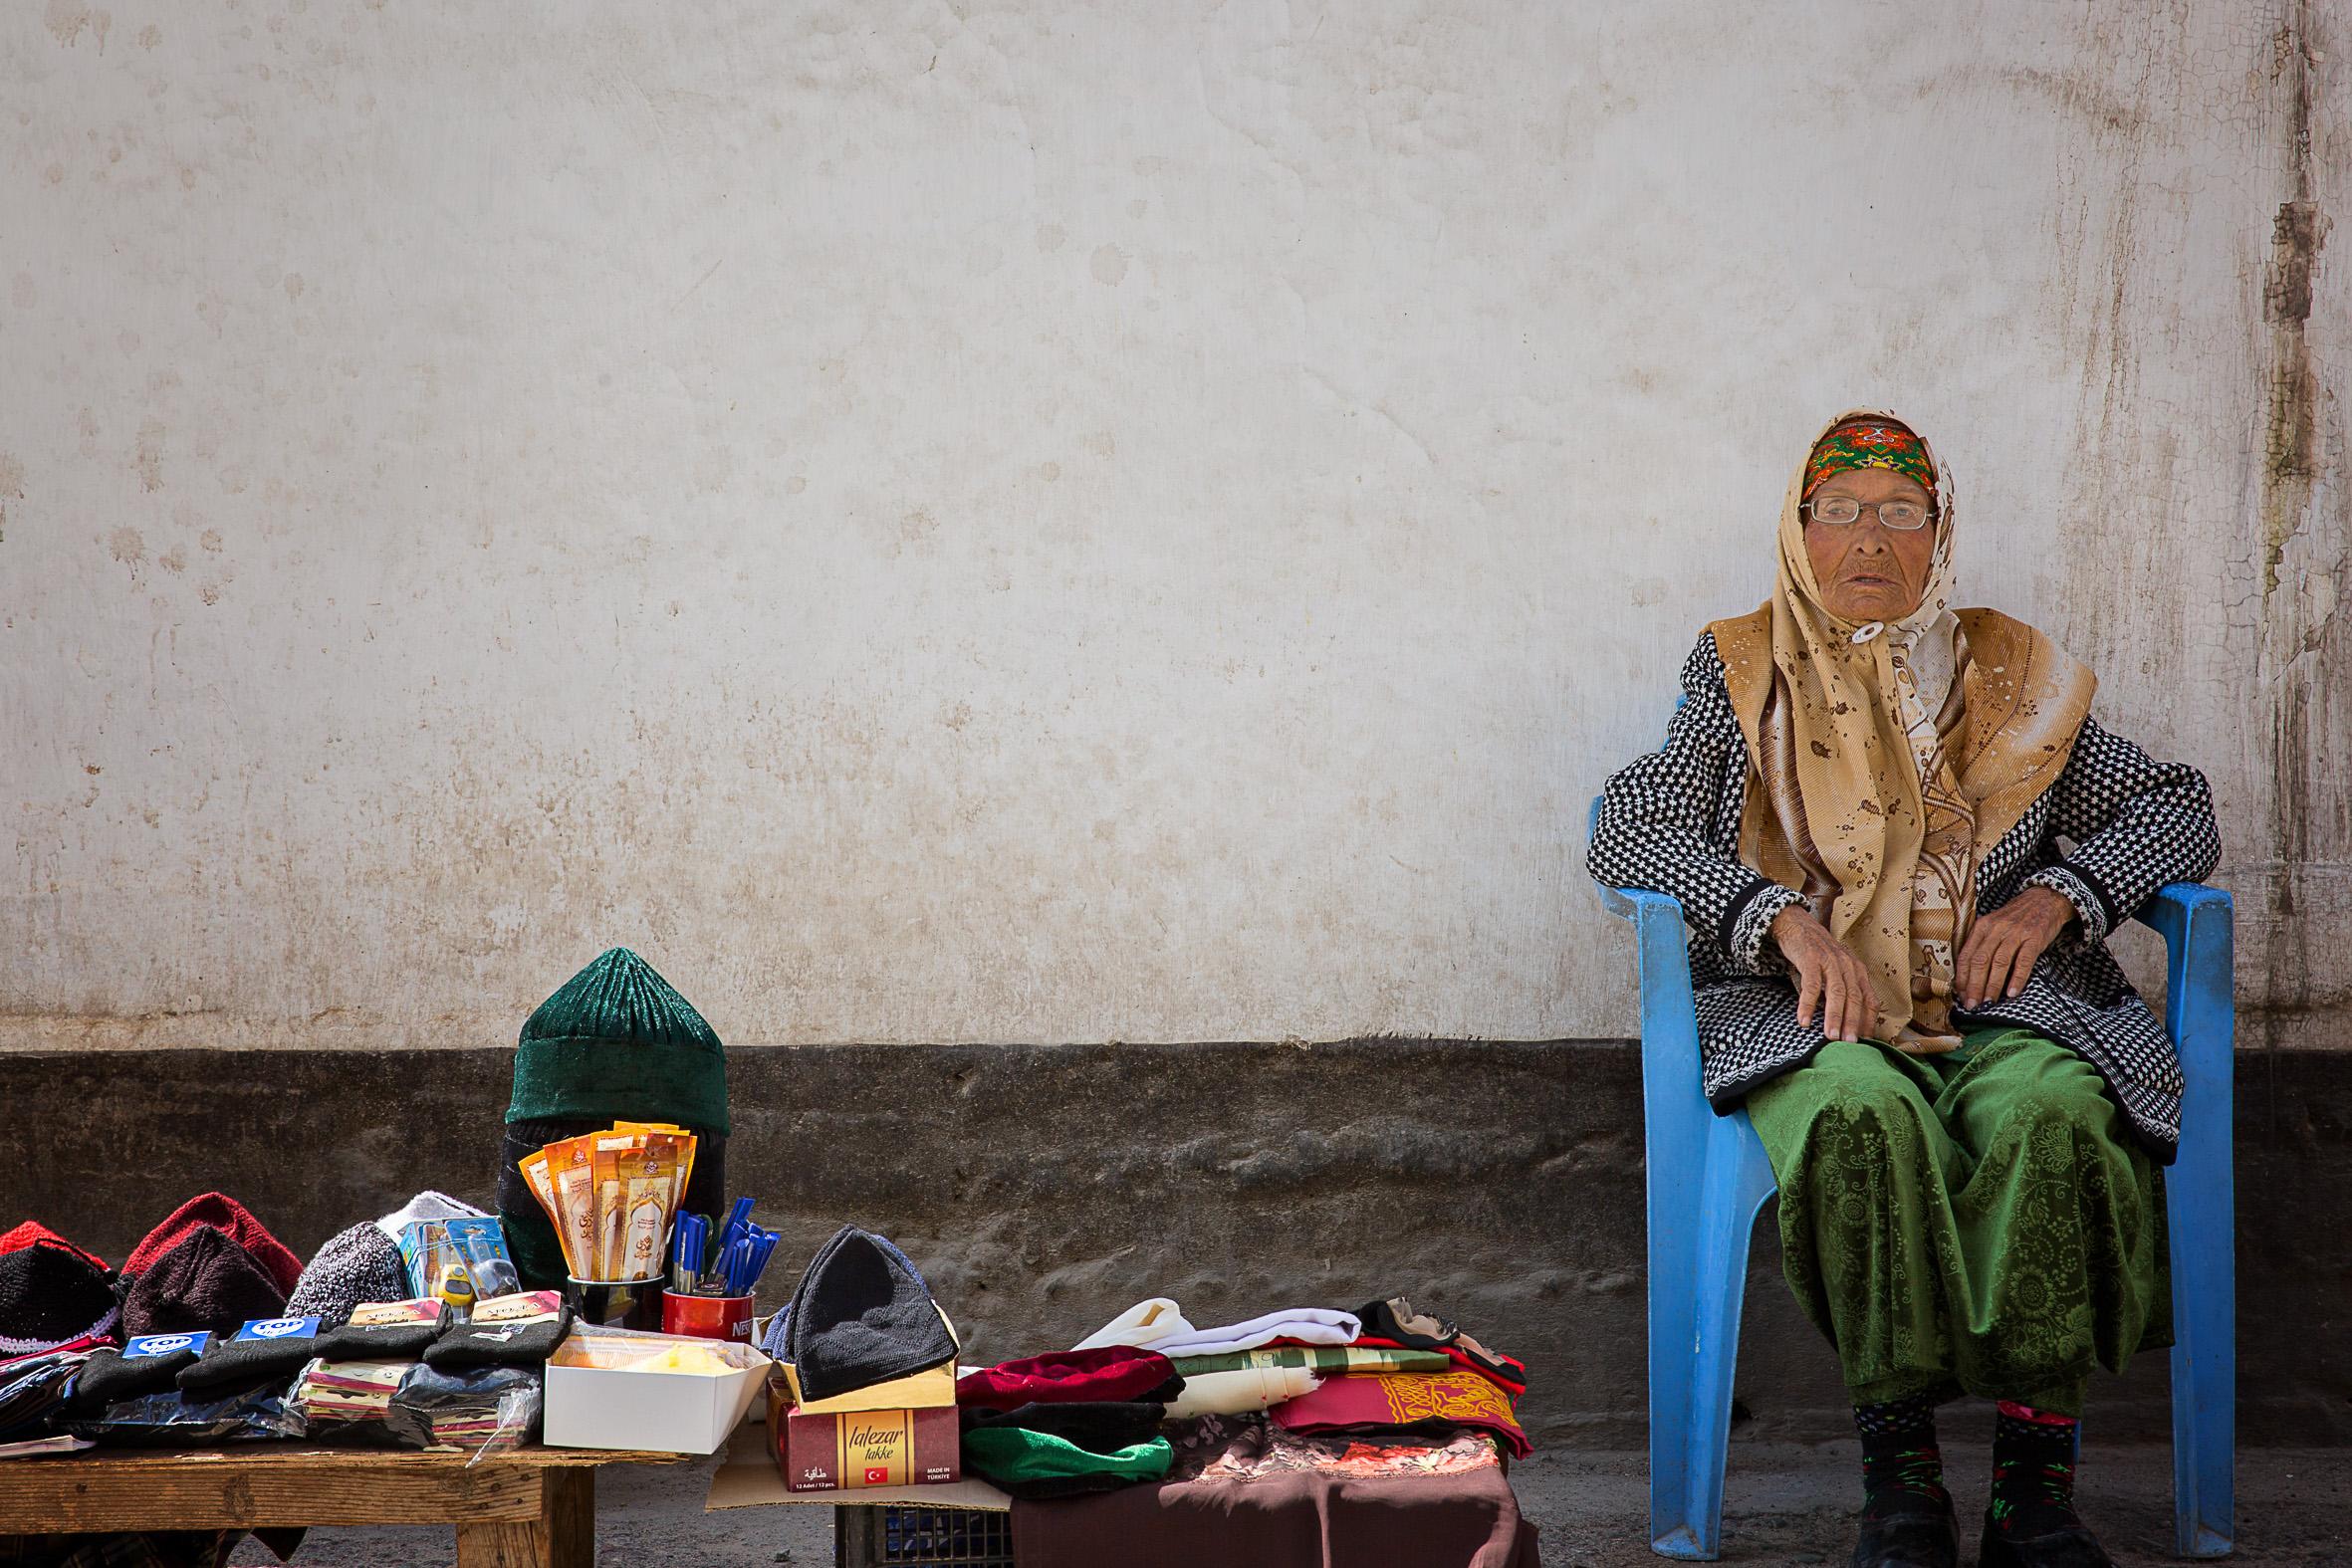 Mosque sales lady, Dushanbe/Tajikistan, April 2016